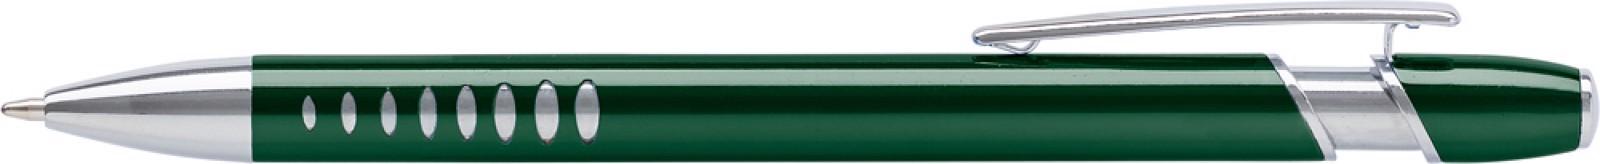 Aluminium ballpen with UV coating - Green